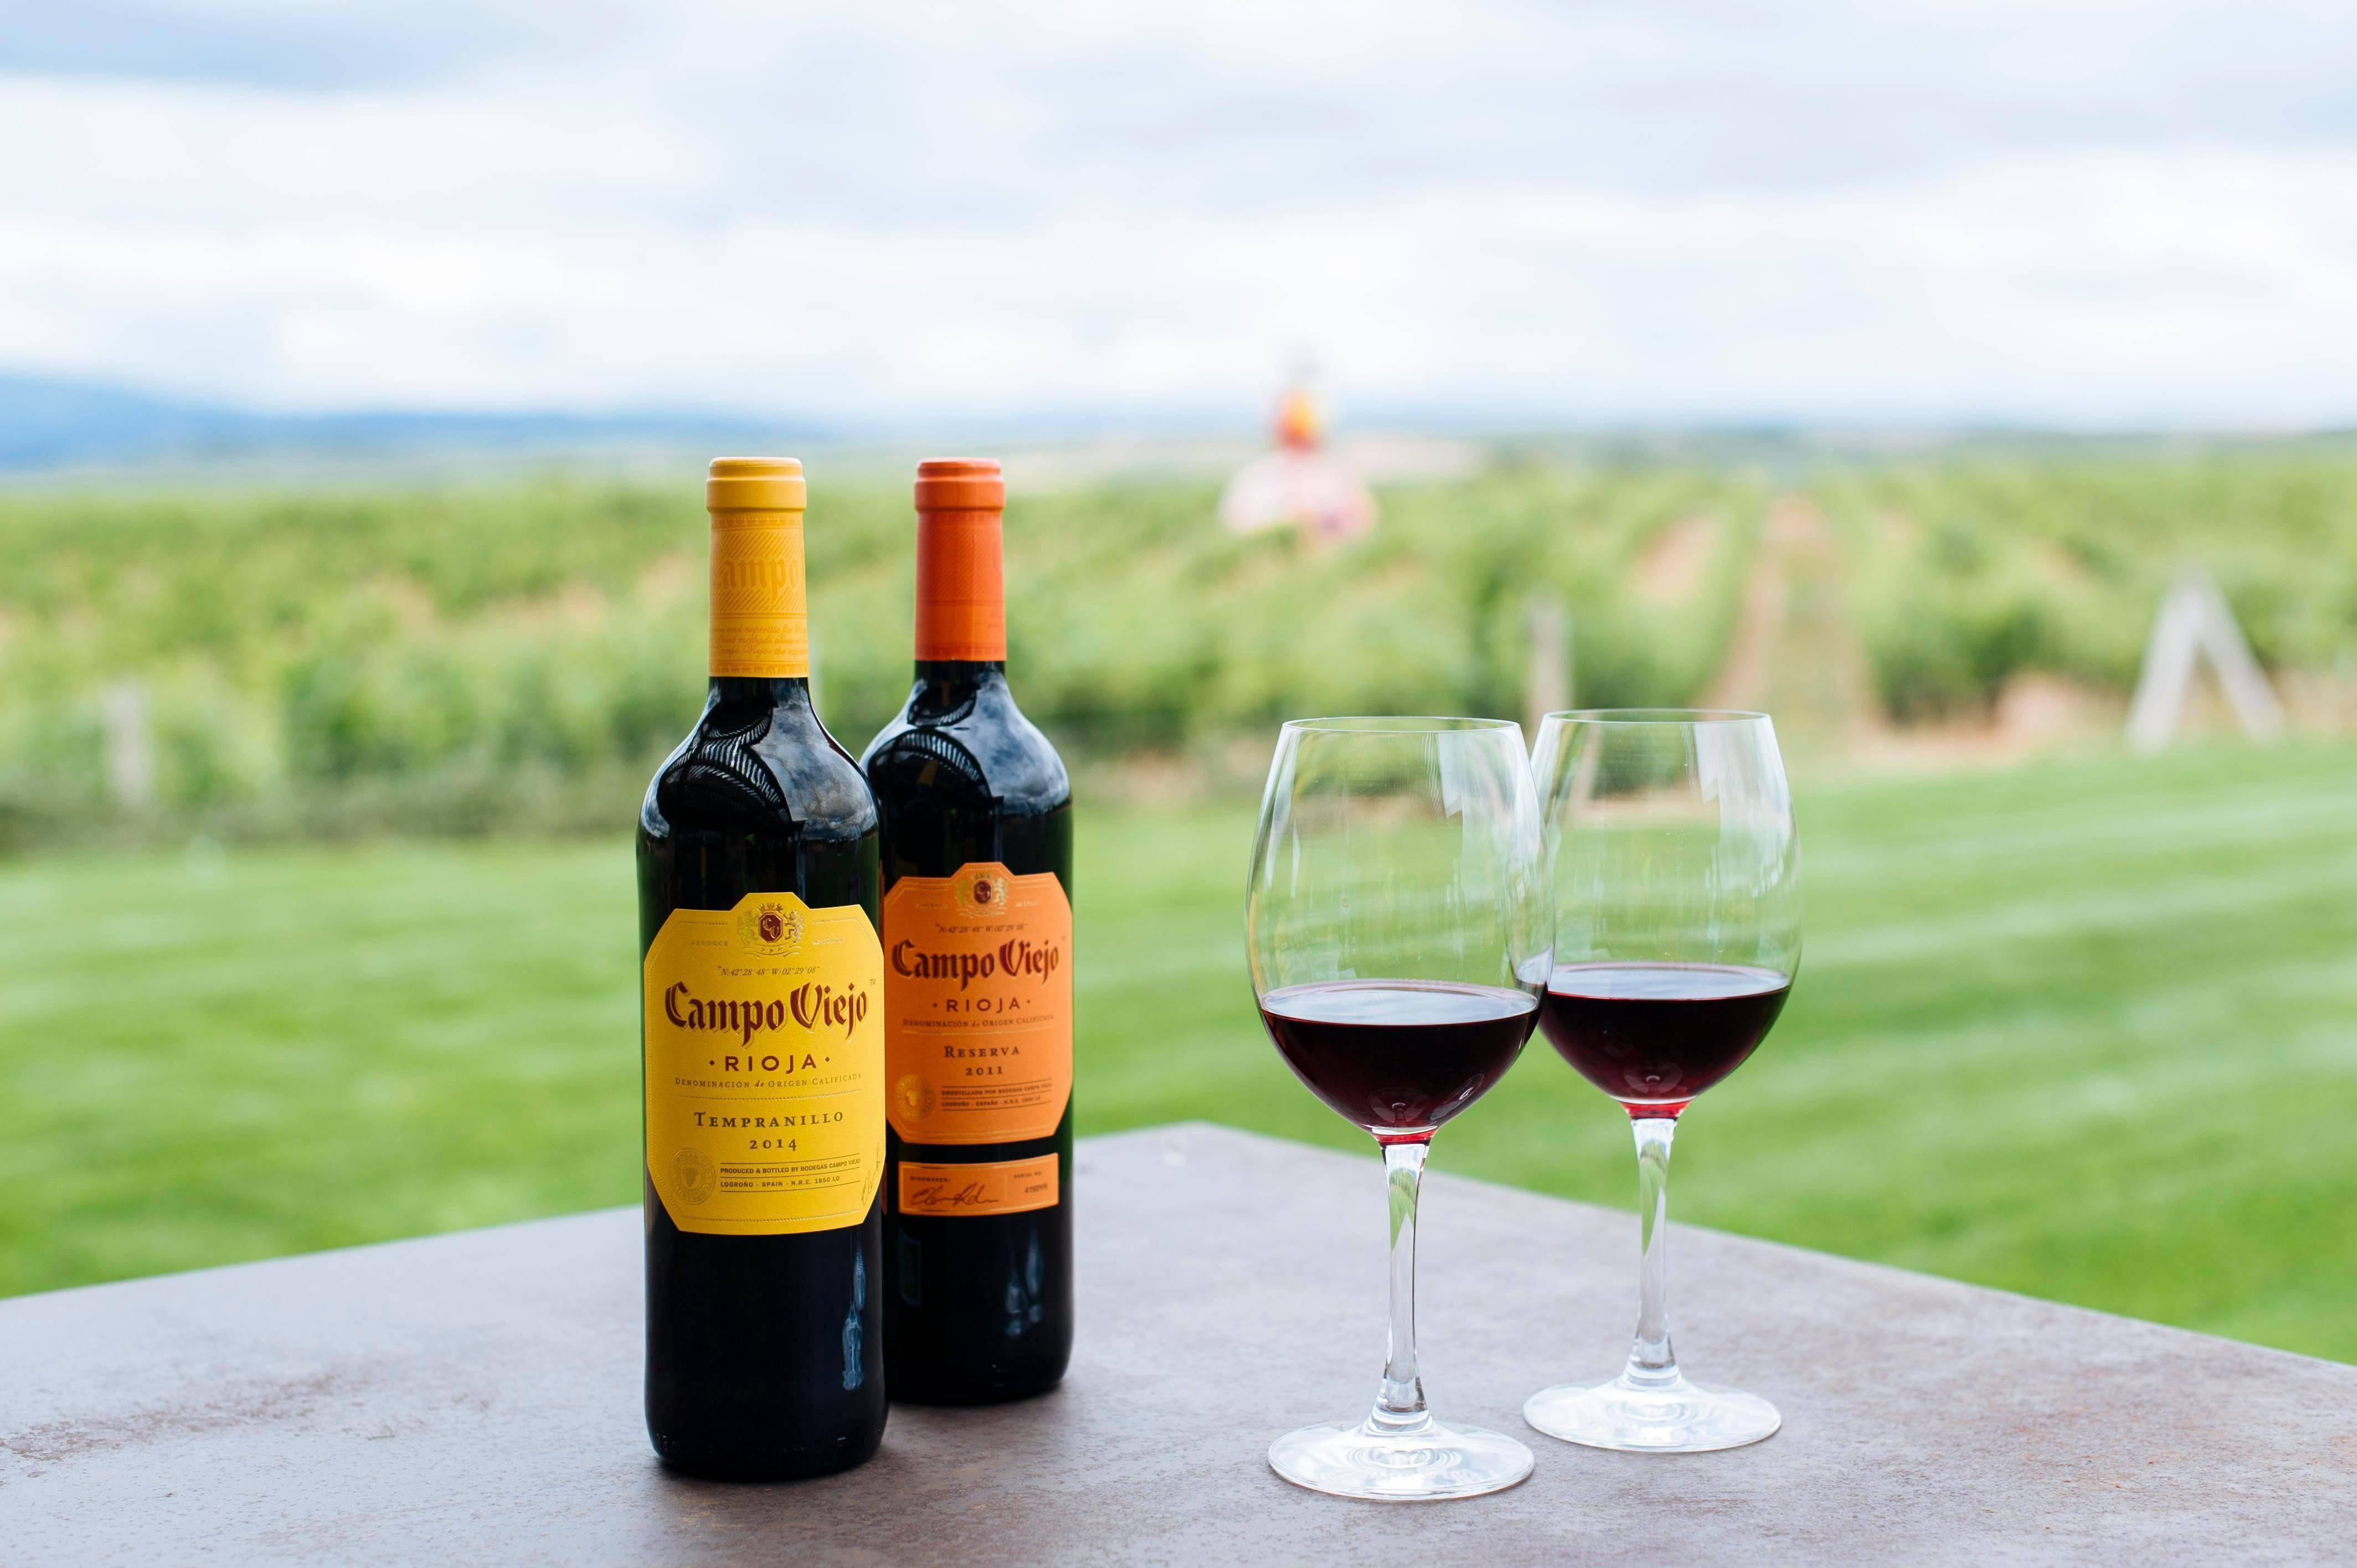 Вино риоха-особенности региона, характеристики, марки